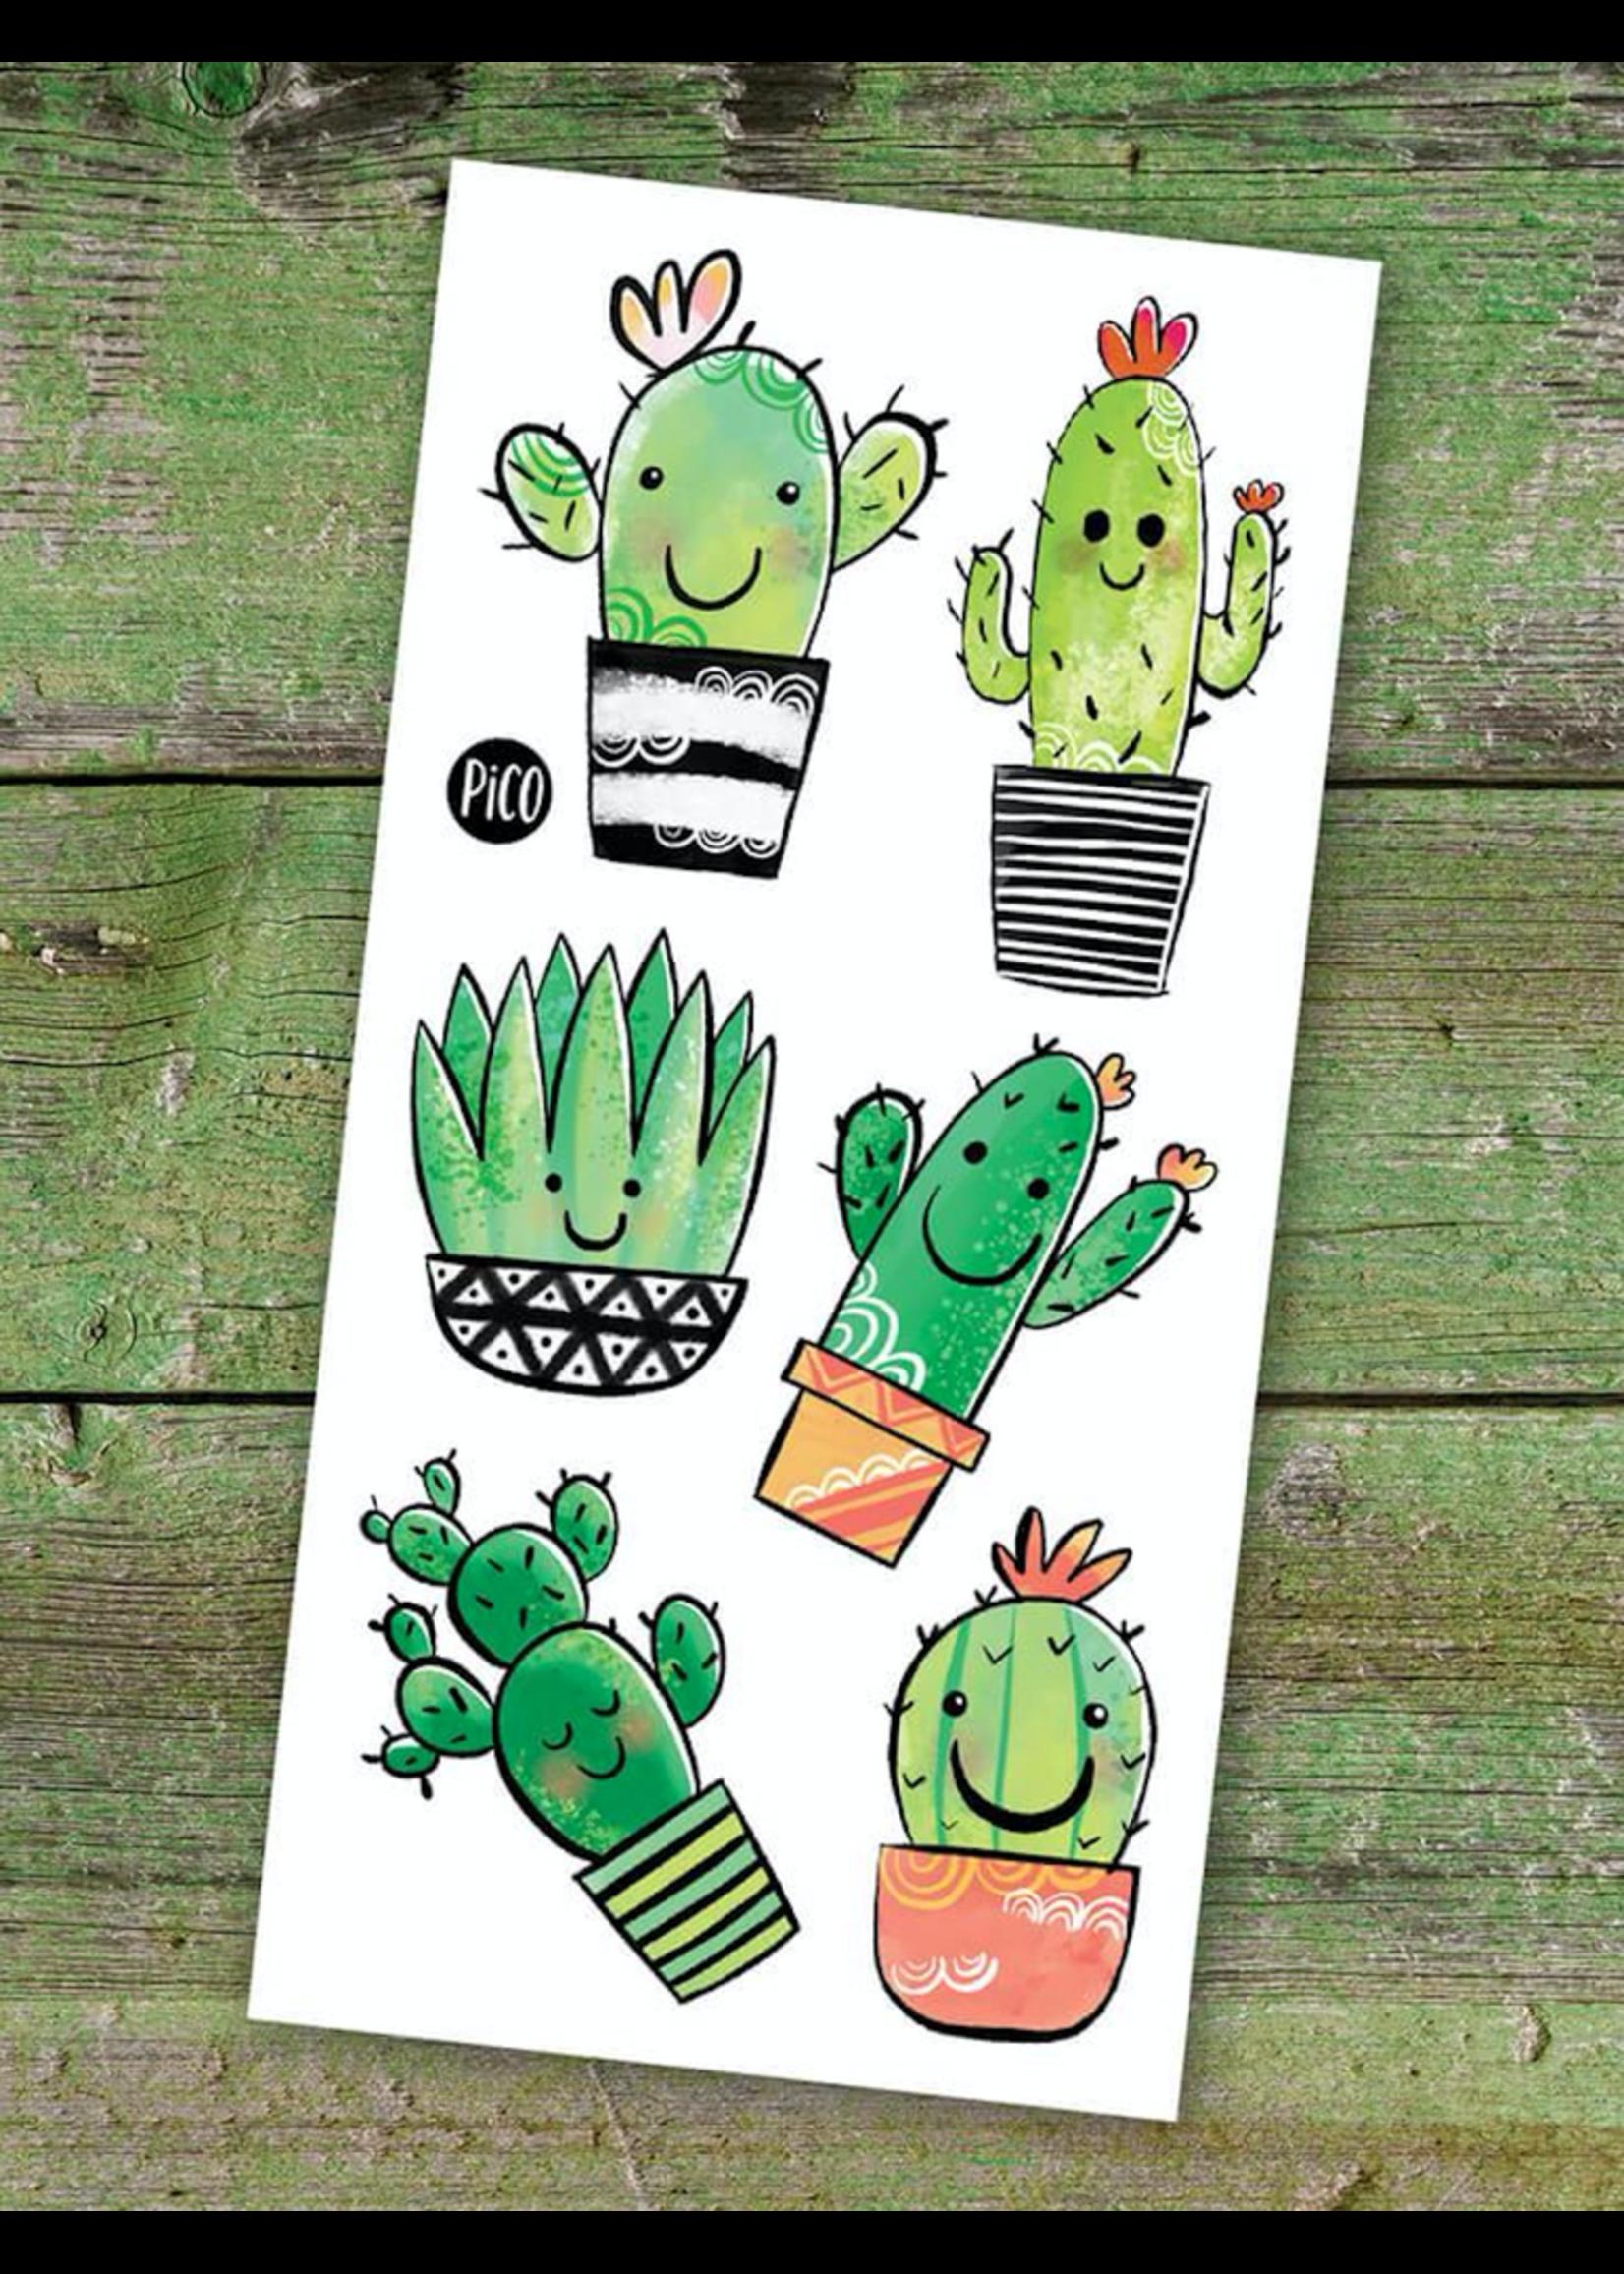 PiCO Tatoo Pico Temporary Tattoos, Cute Cacti